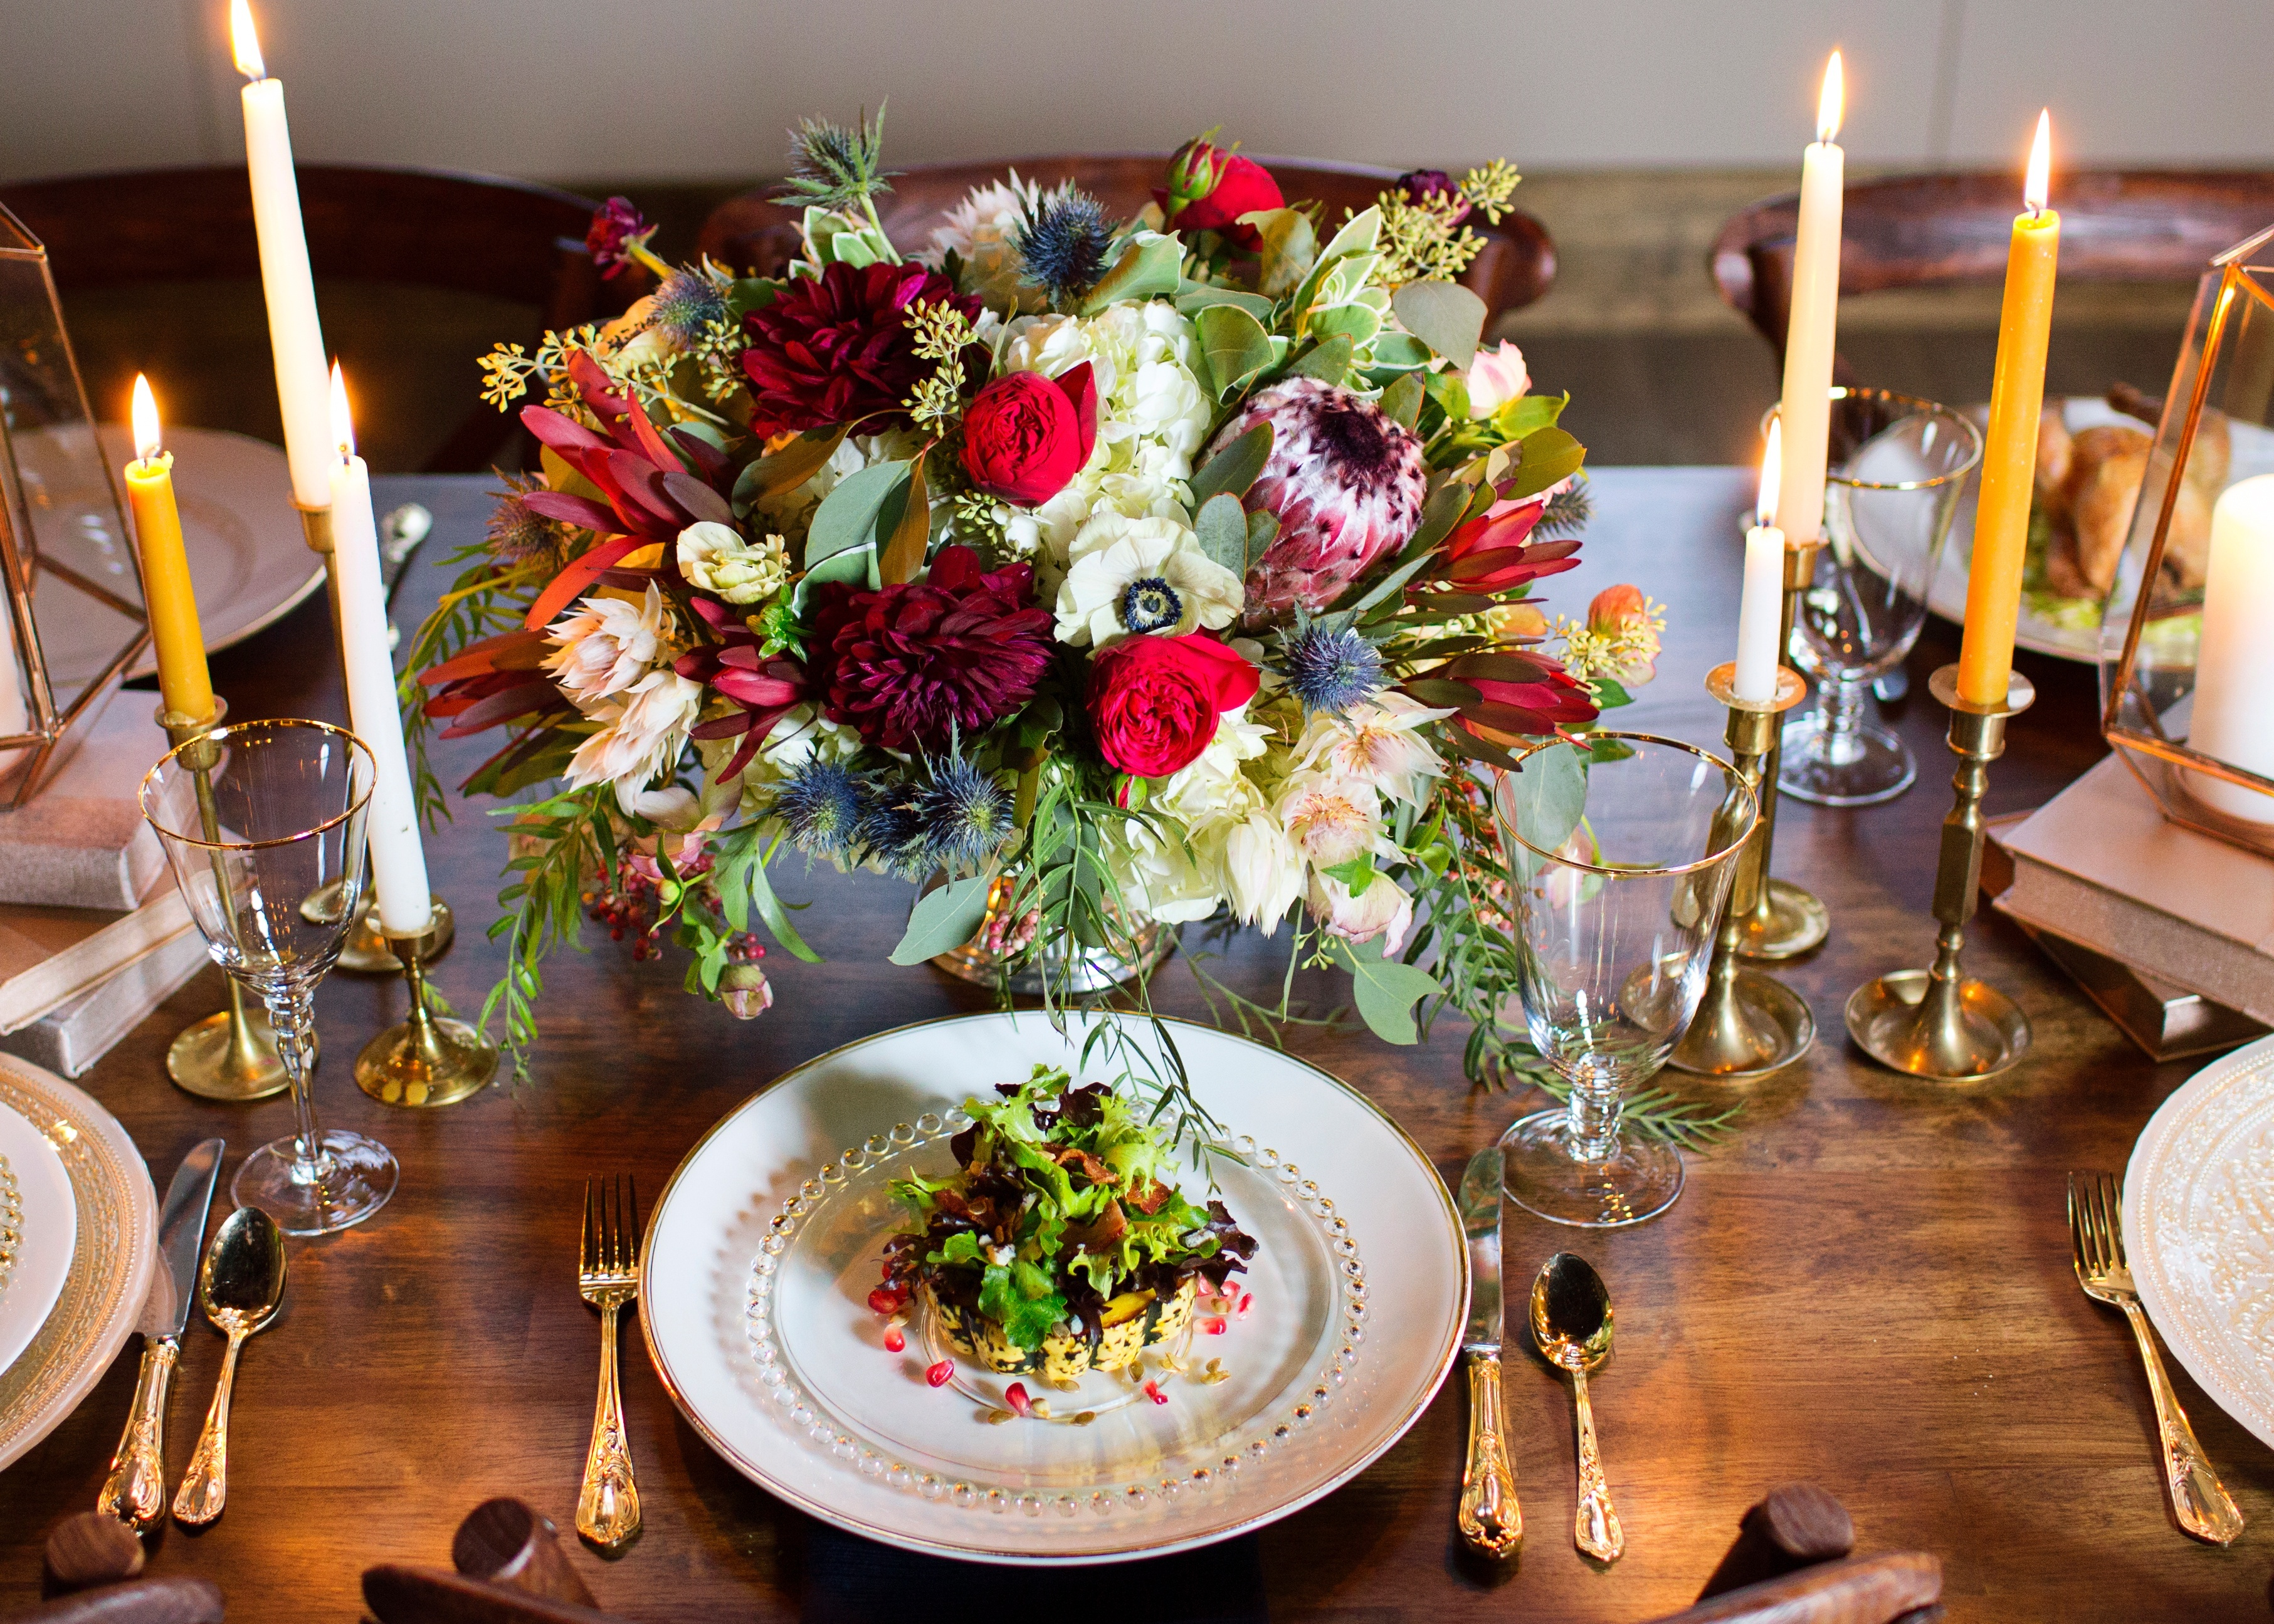 Wedding Florist Survey Results